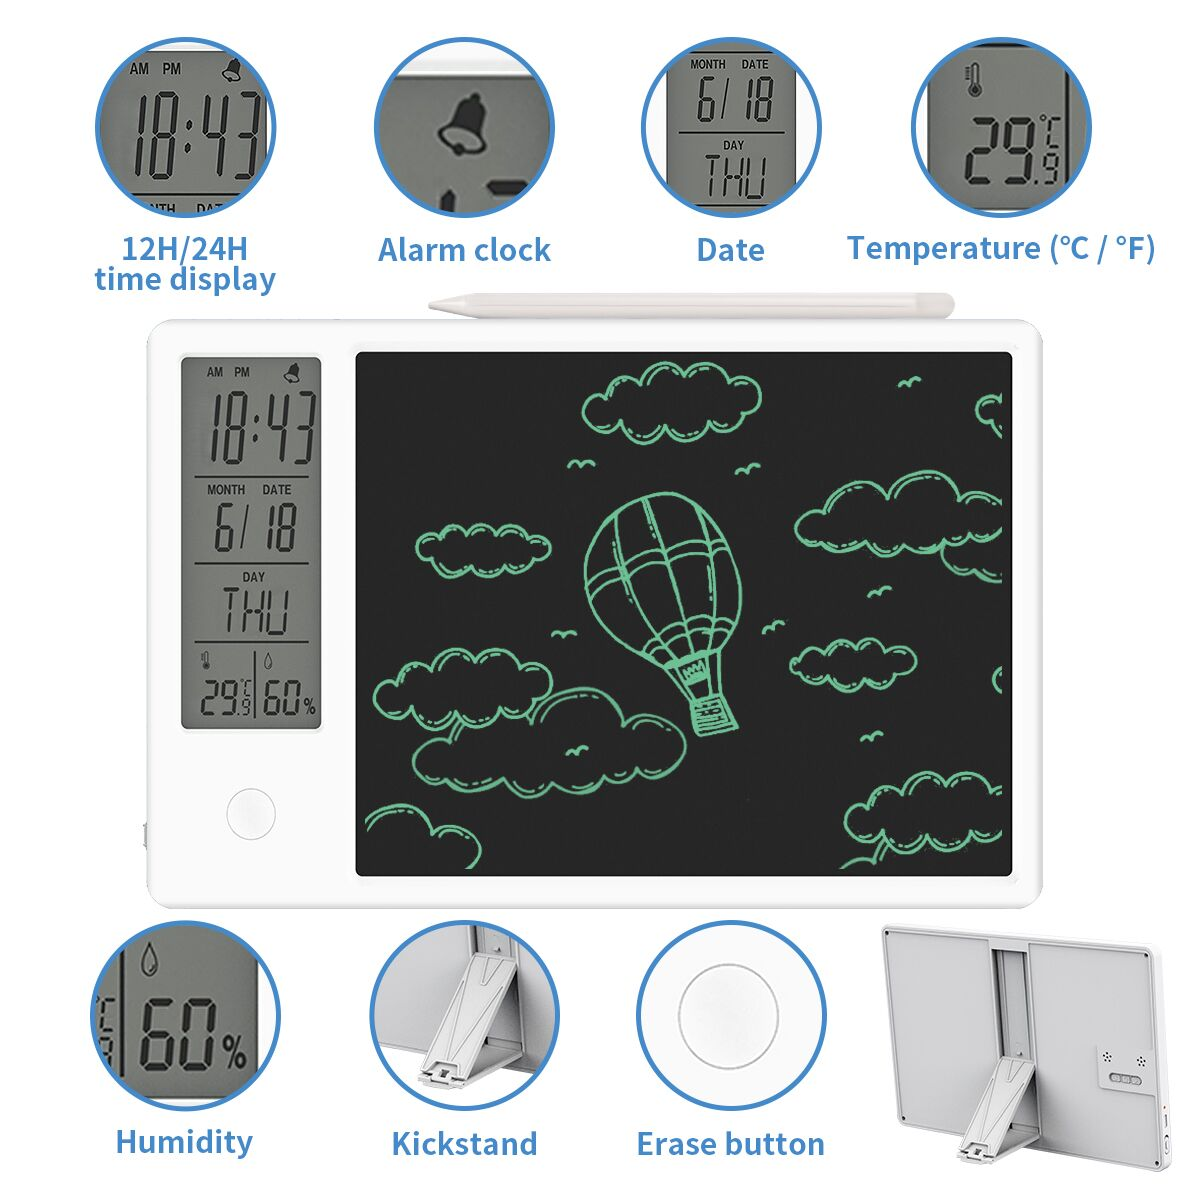 7 weatherpad.jpg